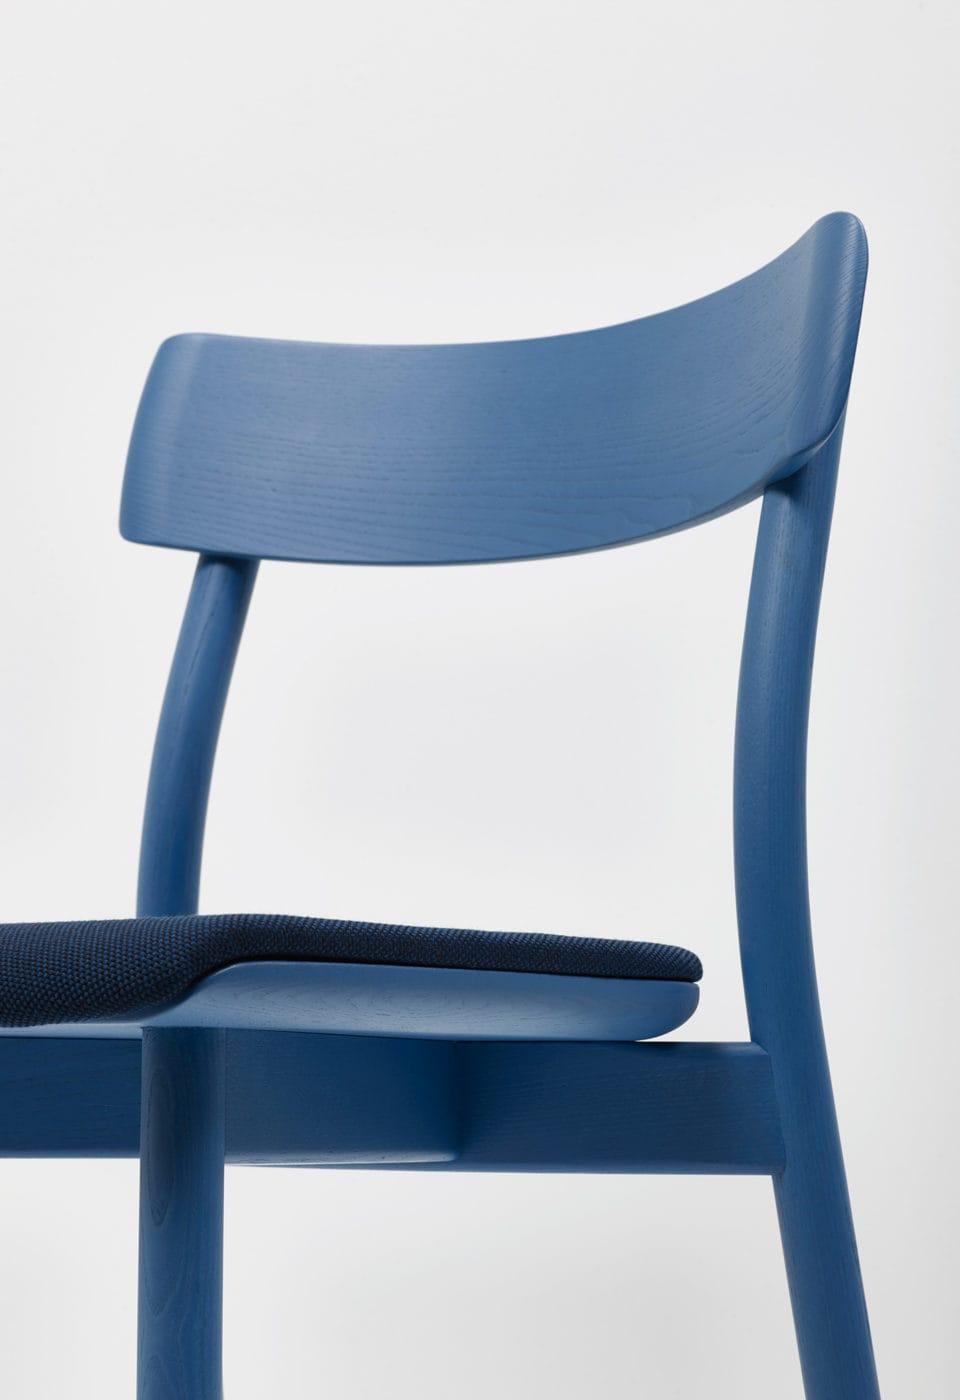 Mc8 Chiaro Collection By Leon Ransmeier For Mattiazzi